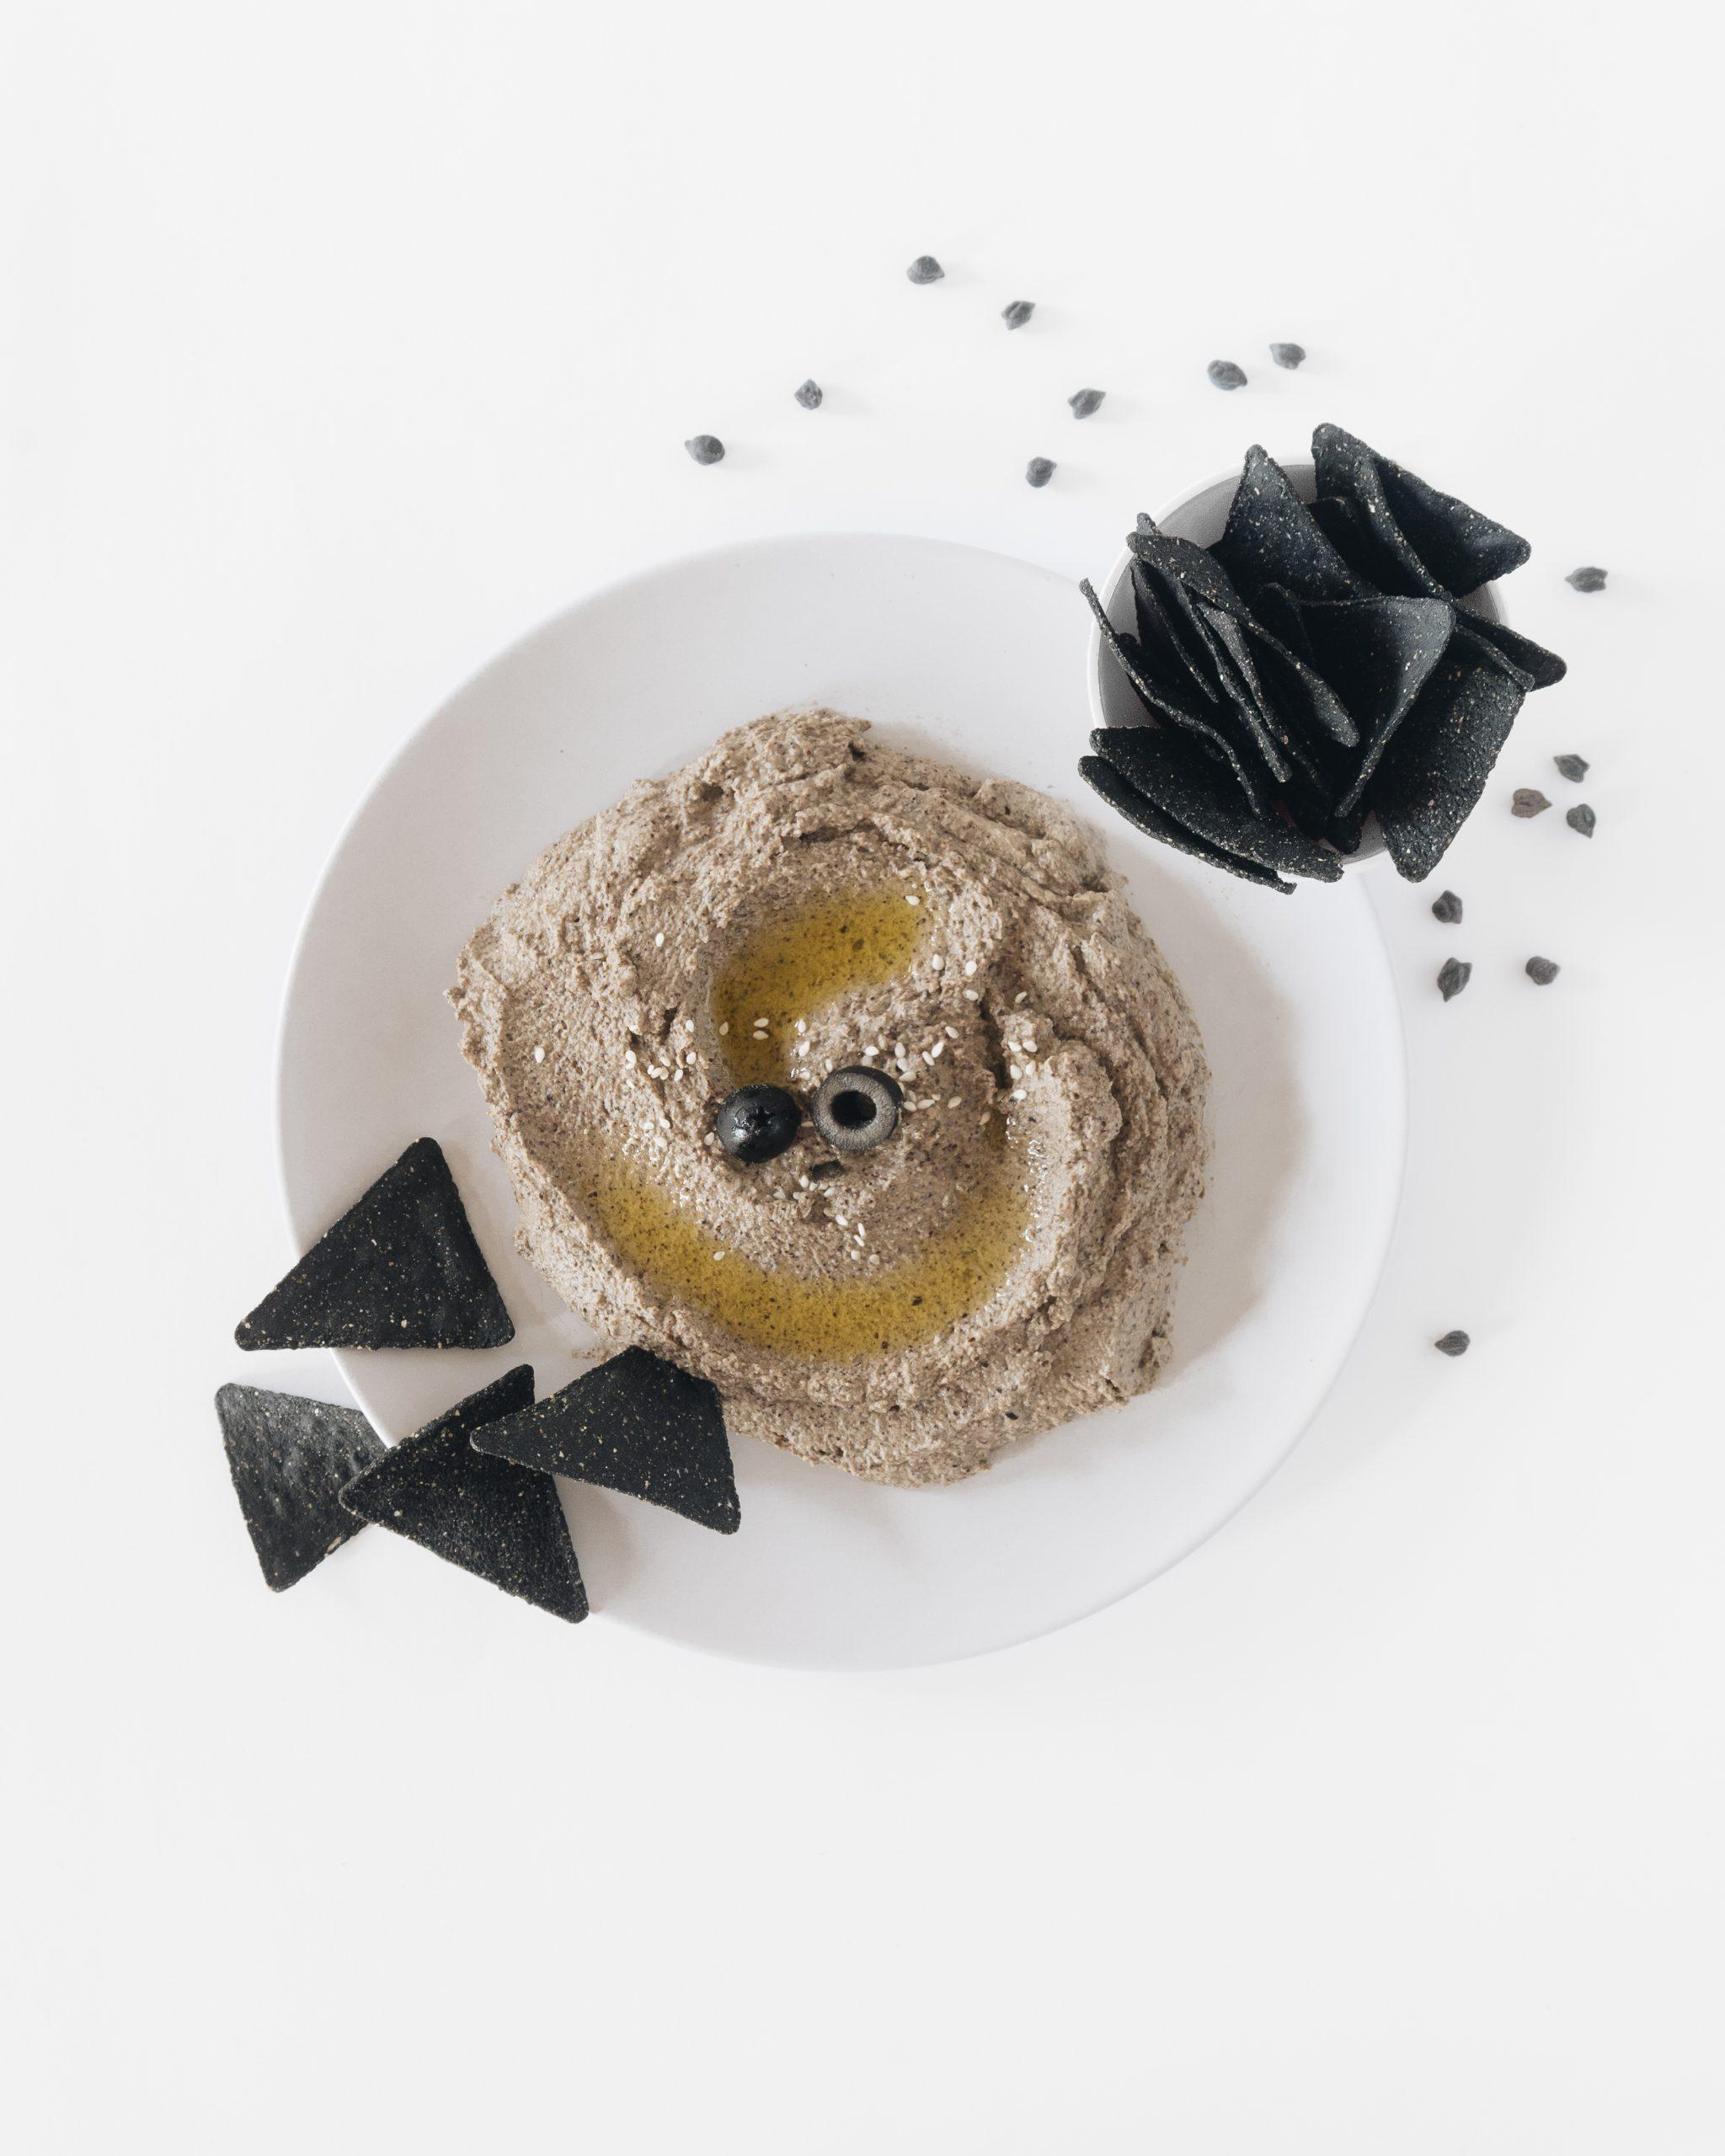 hummus con olivas negras